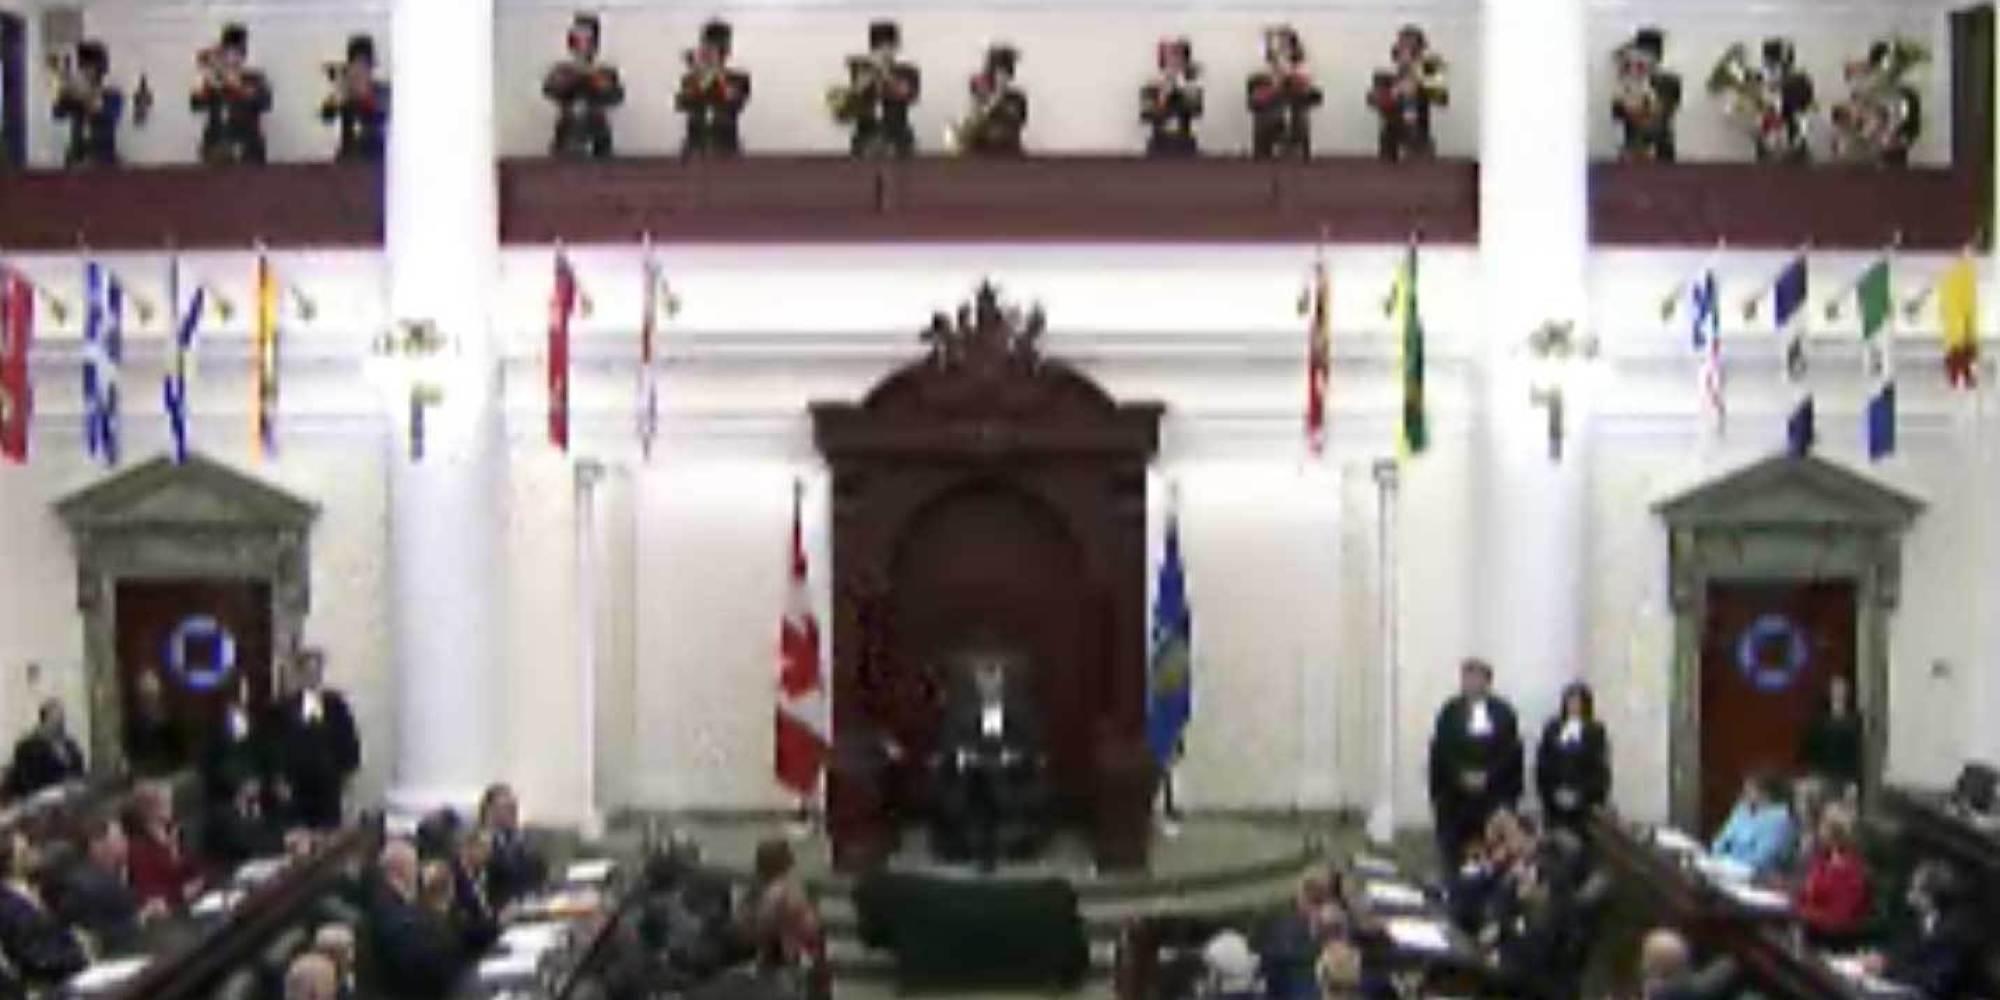 Alberta Throne Speech 2014 Promises Renewed Funding For Cities